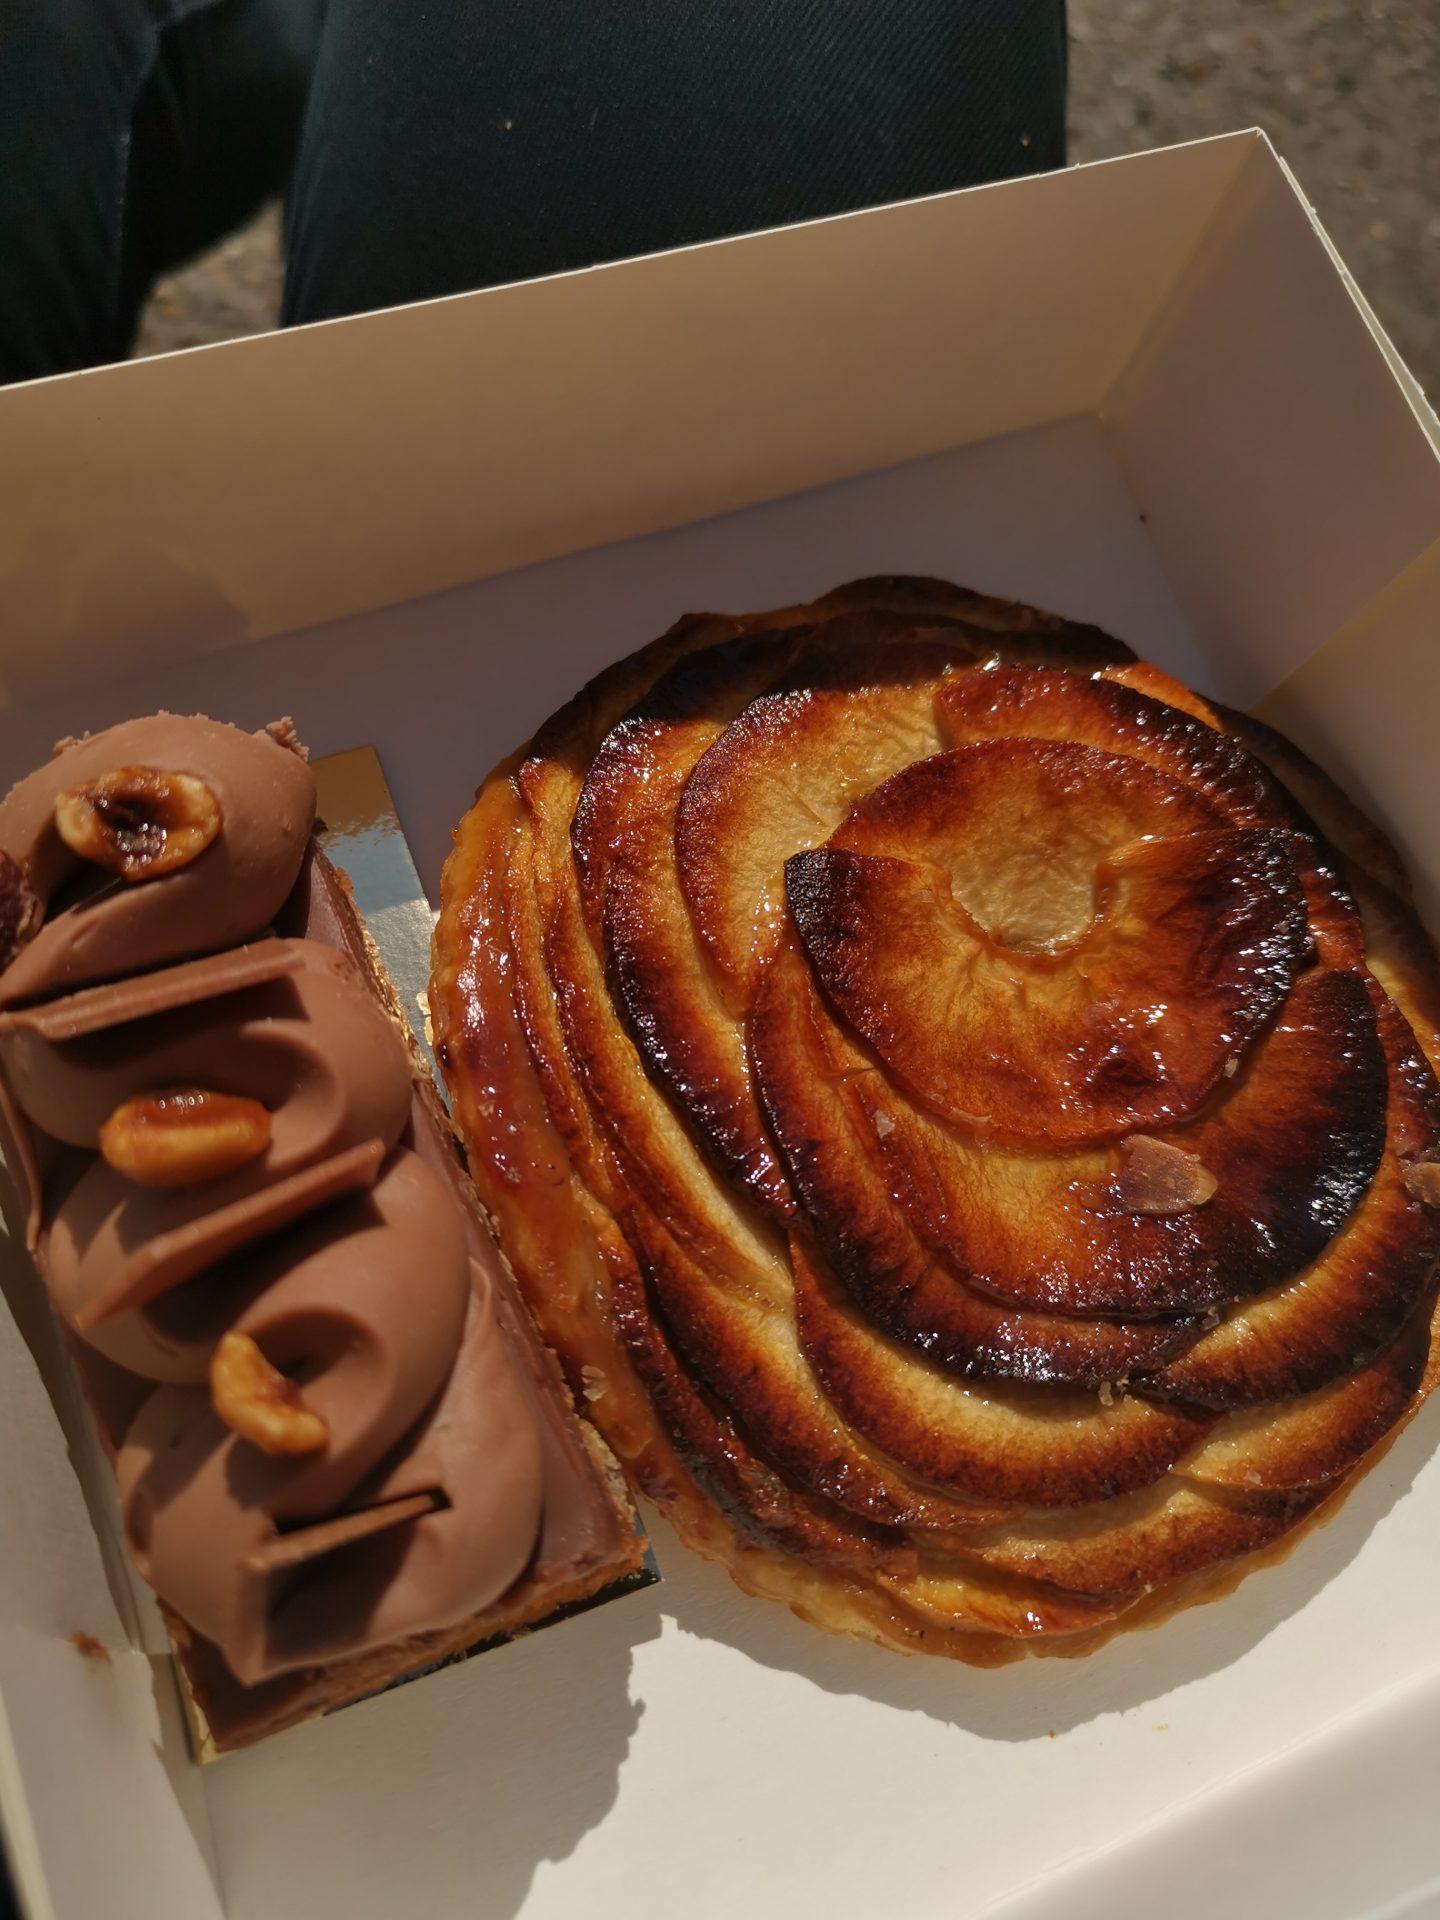 Pastry tarte tatin